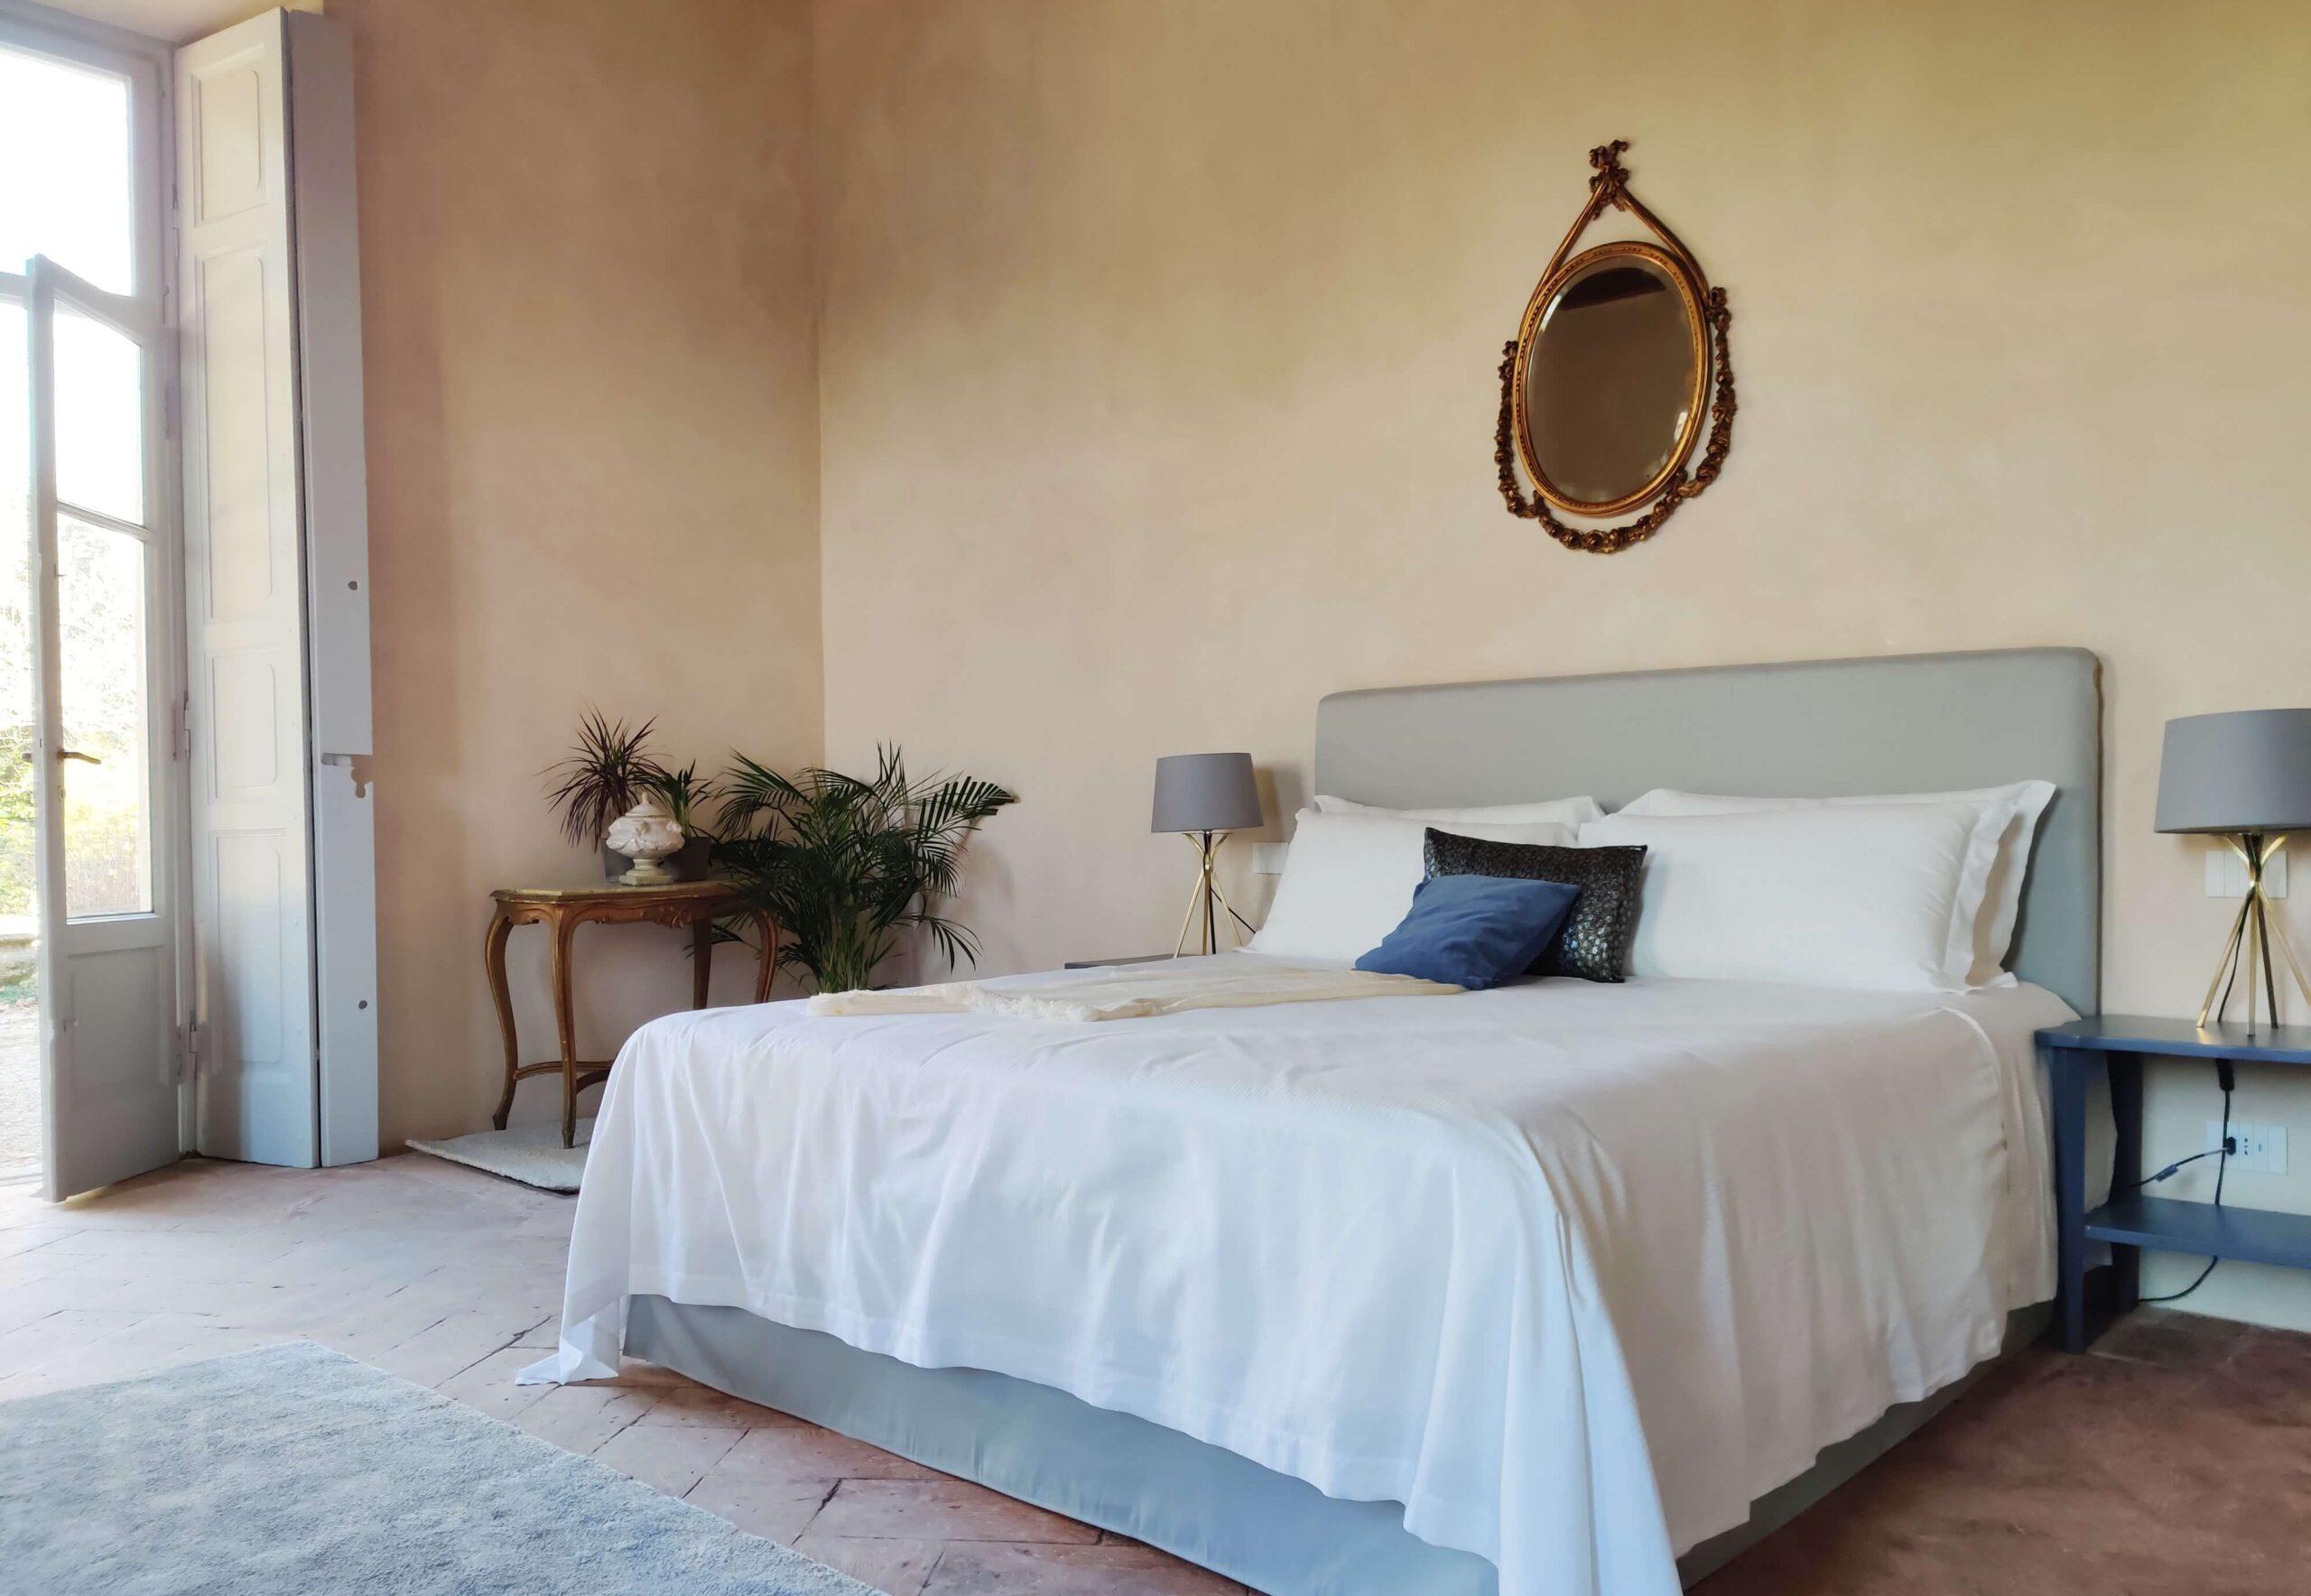 Dandelion Como - Accommodations Photo 7